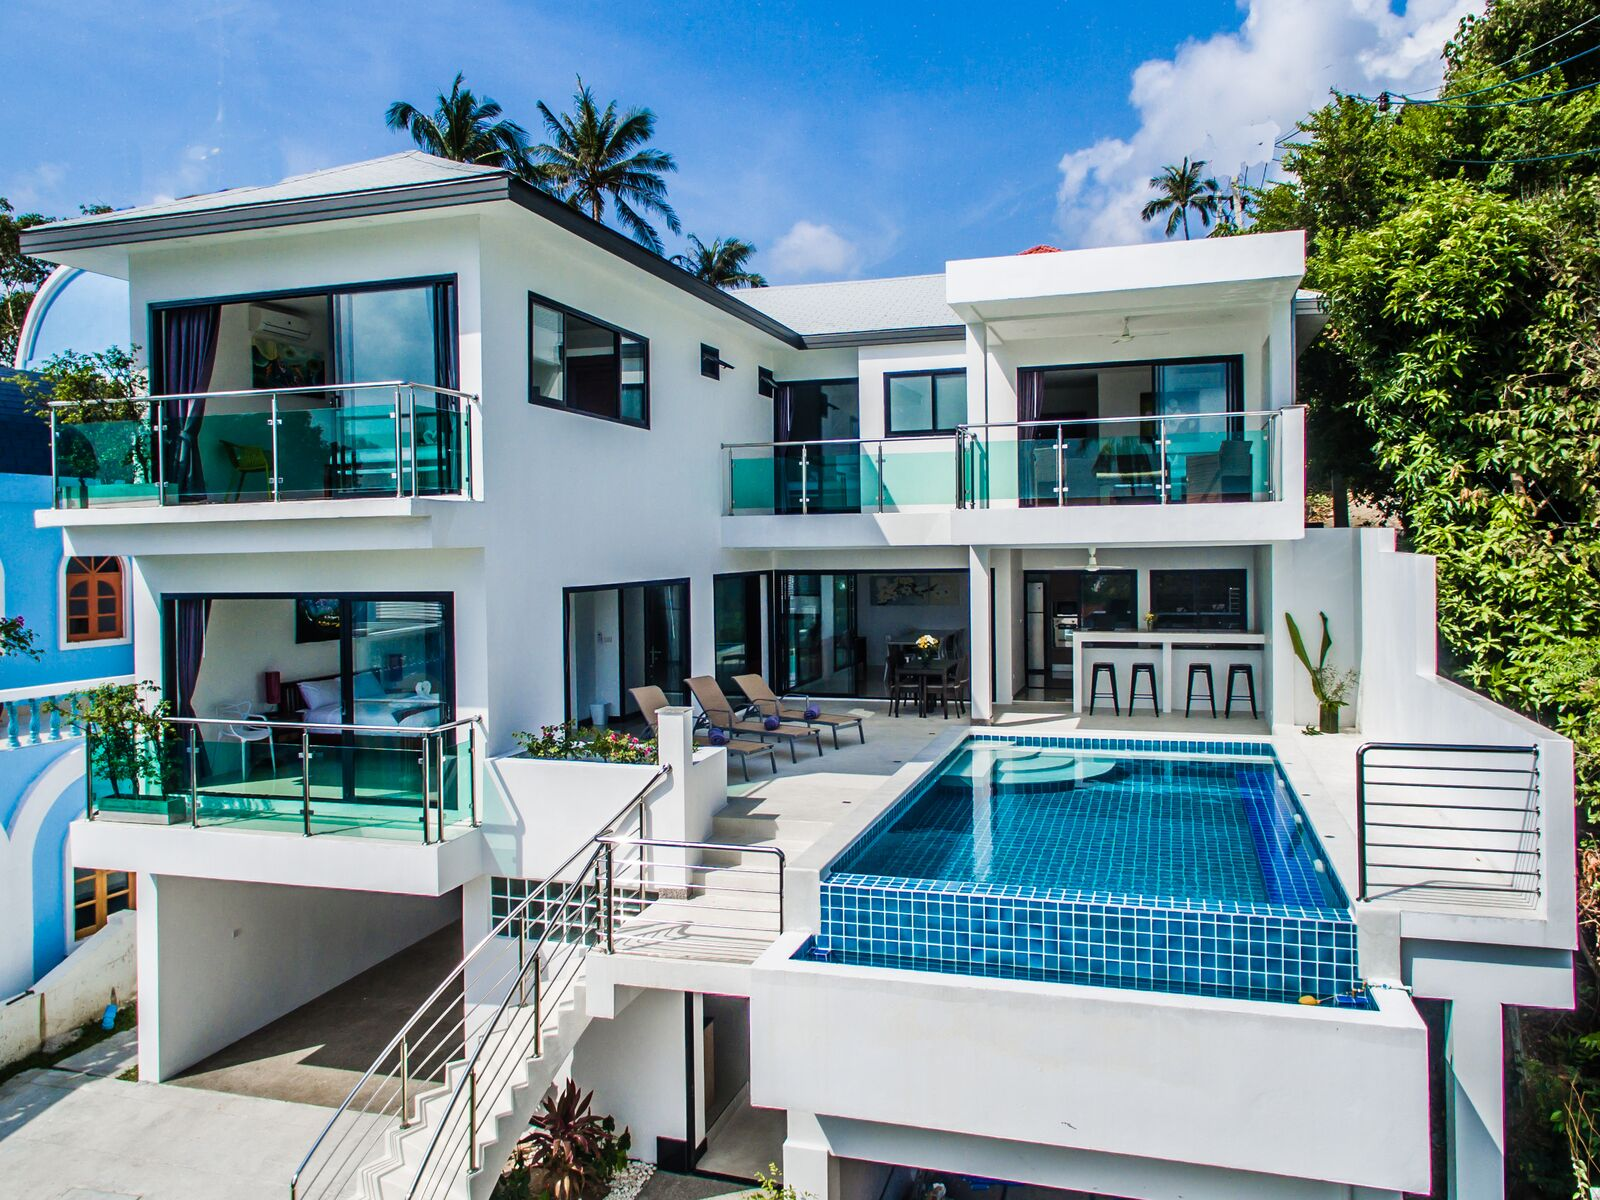 4 Bedroom Sea View Villa with Private Pool at Lamai Koh Samui